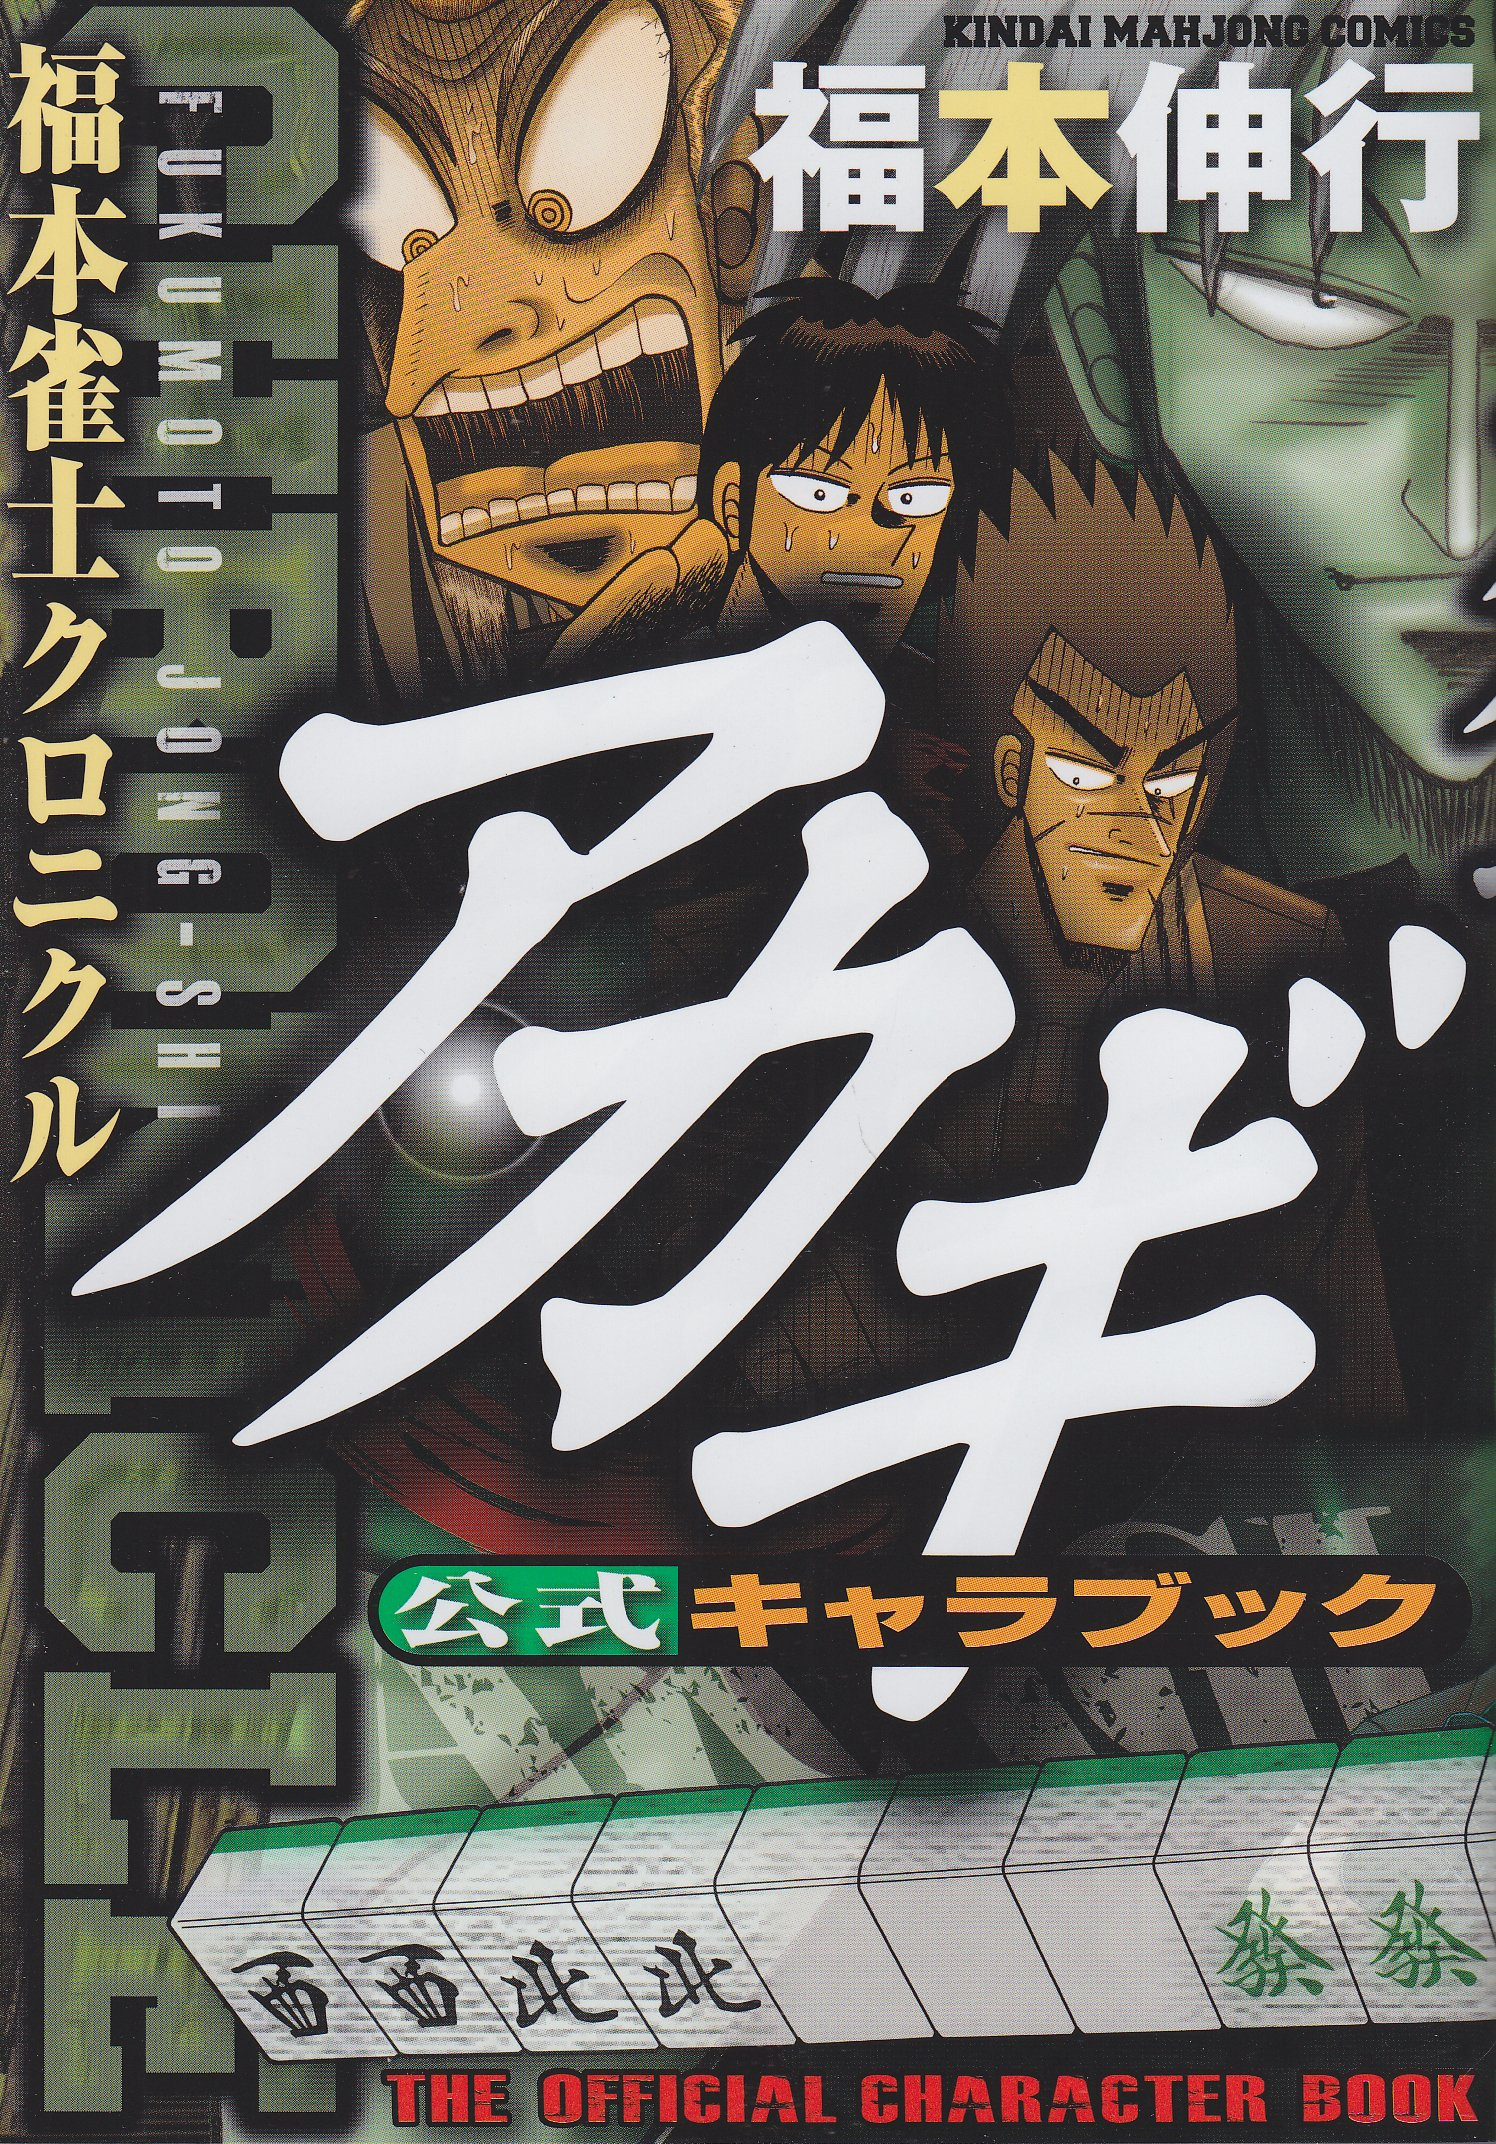 Read Online アカギ公式キャラブック―福本雀士クロニクル (近代麻雀コミックス) pdf epub